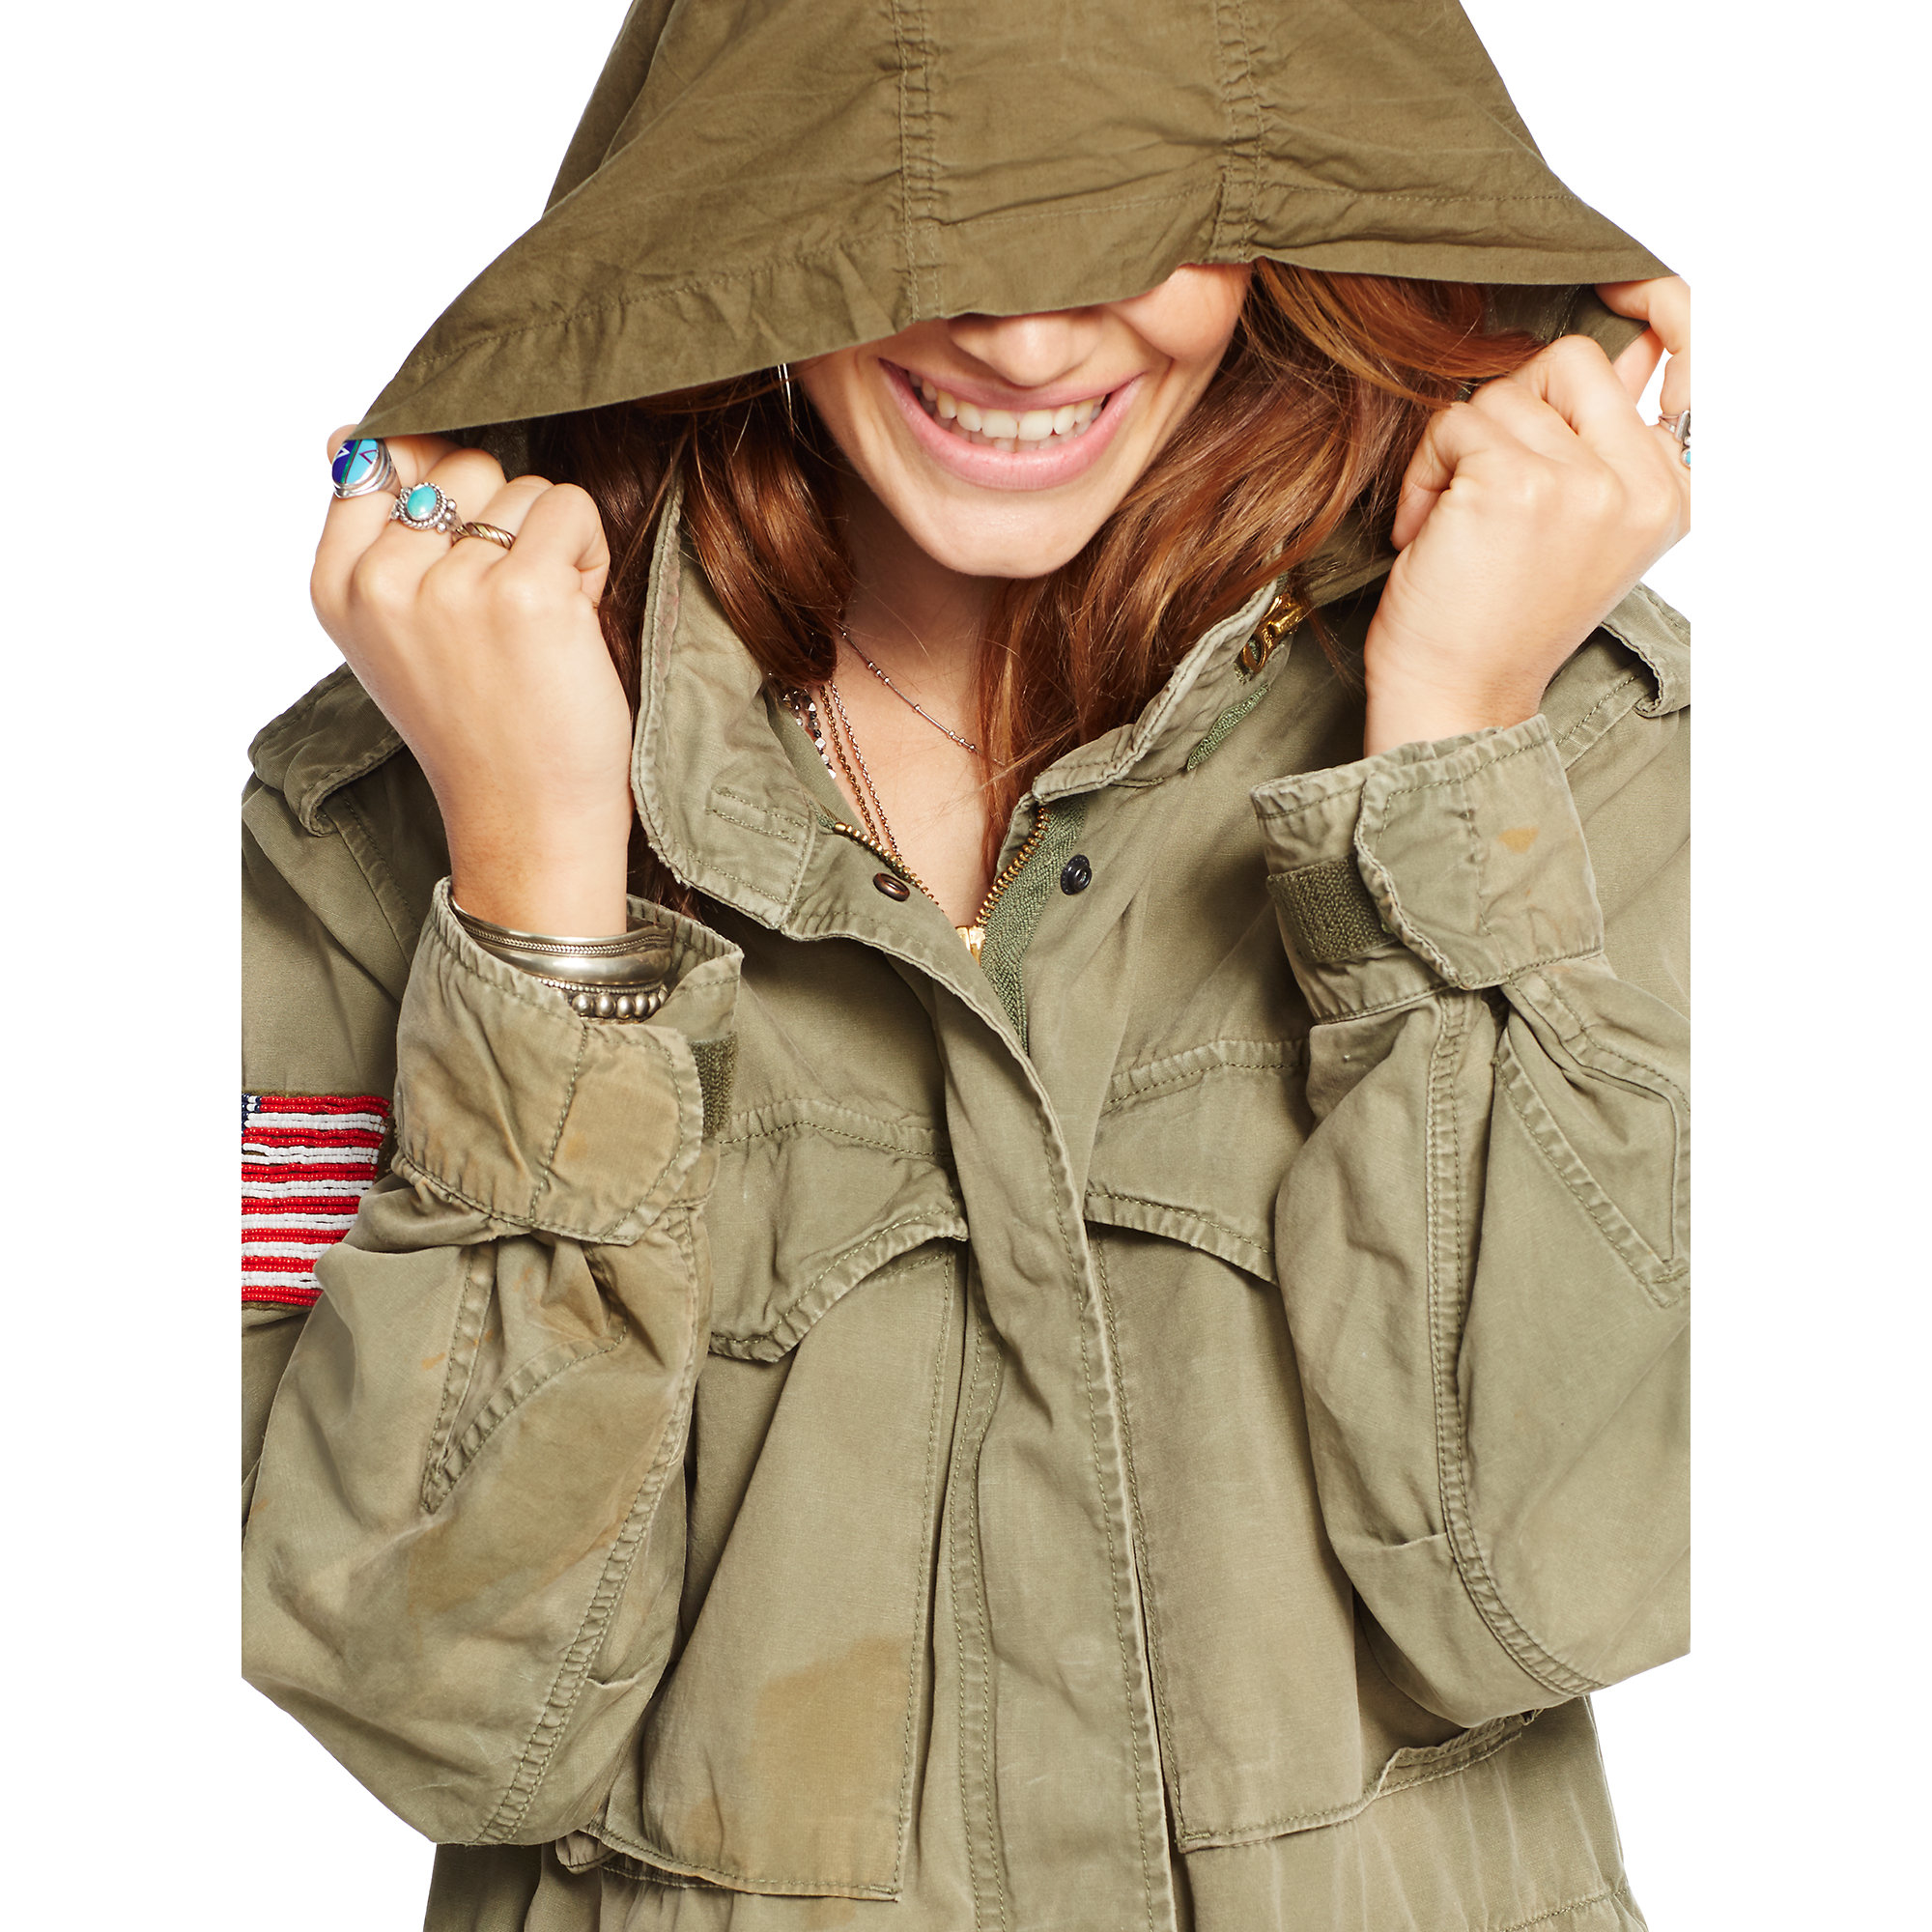 0babb18d8259 denim-supply-ralph-lauren-marine-corp-olive-cotton-canvas-field-jacket-blue-product- 1-226391397-normal.jpeg